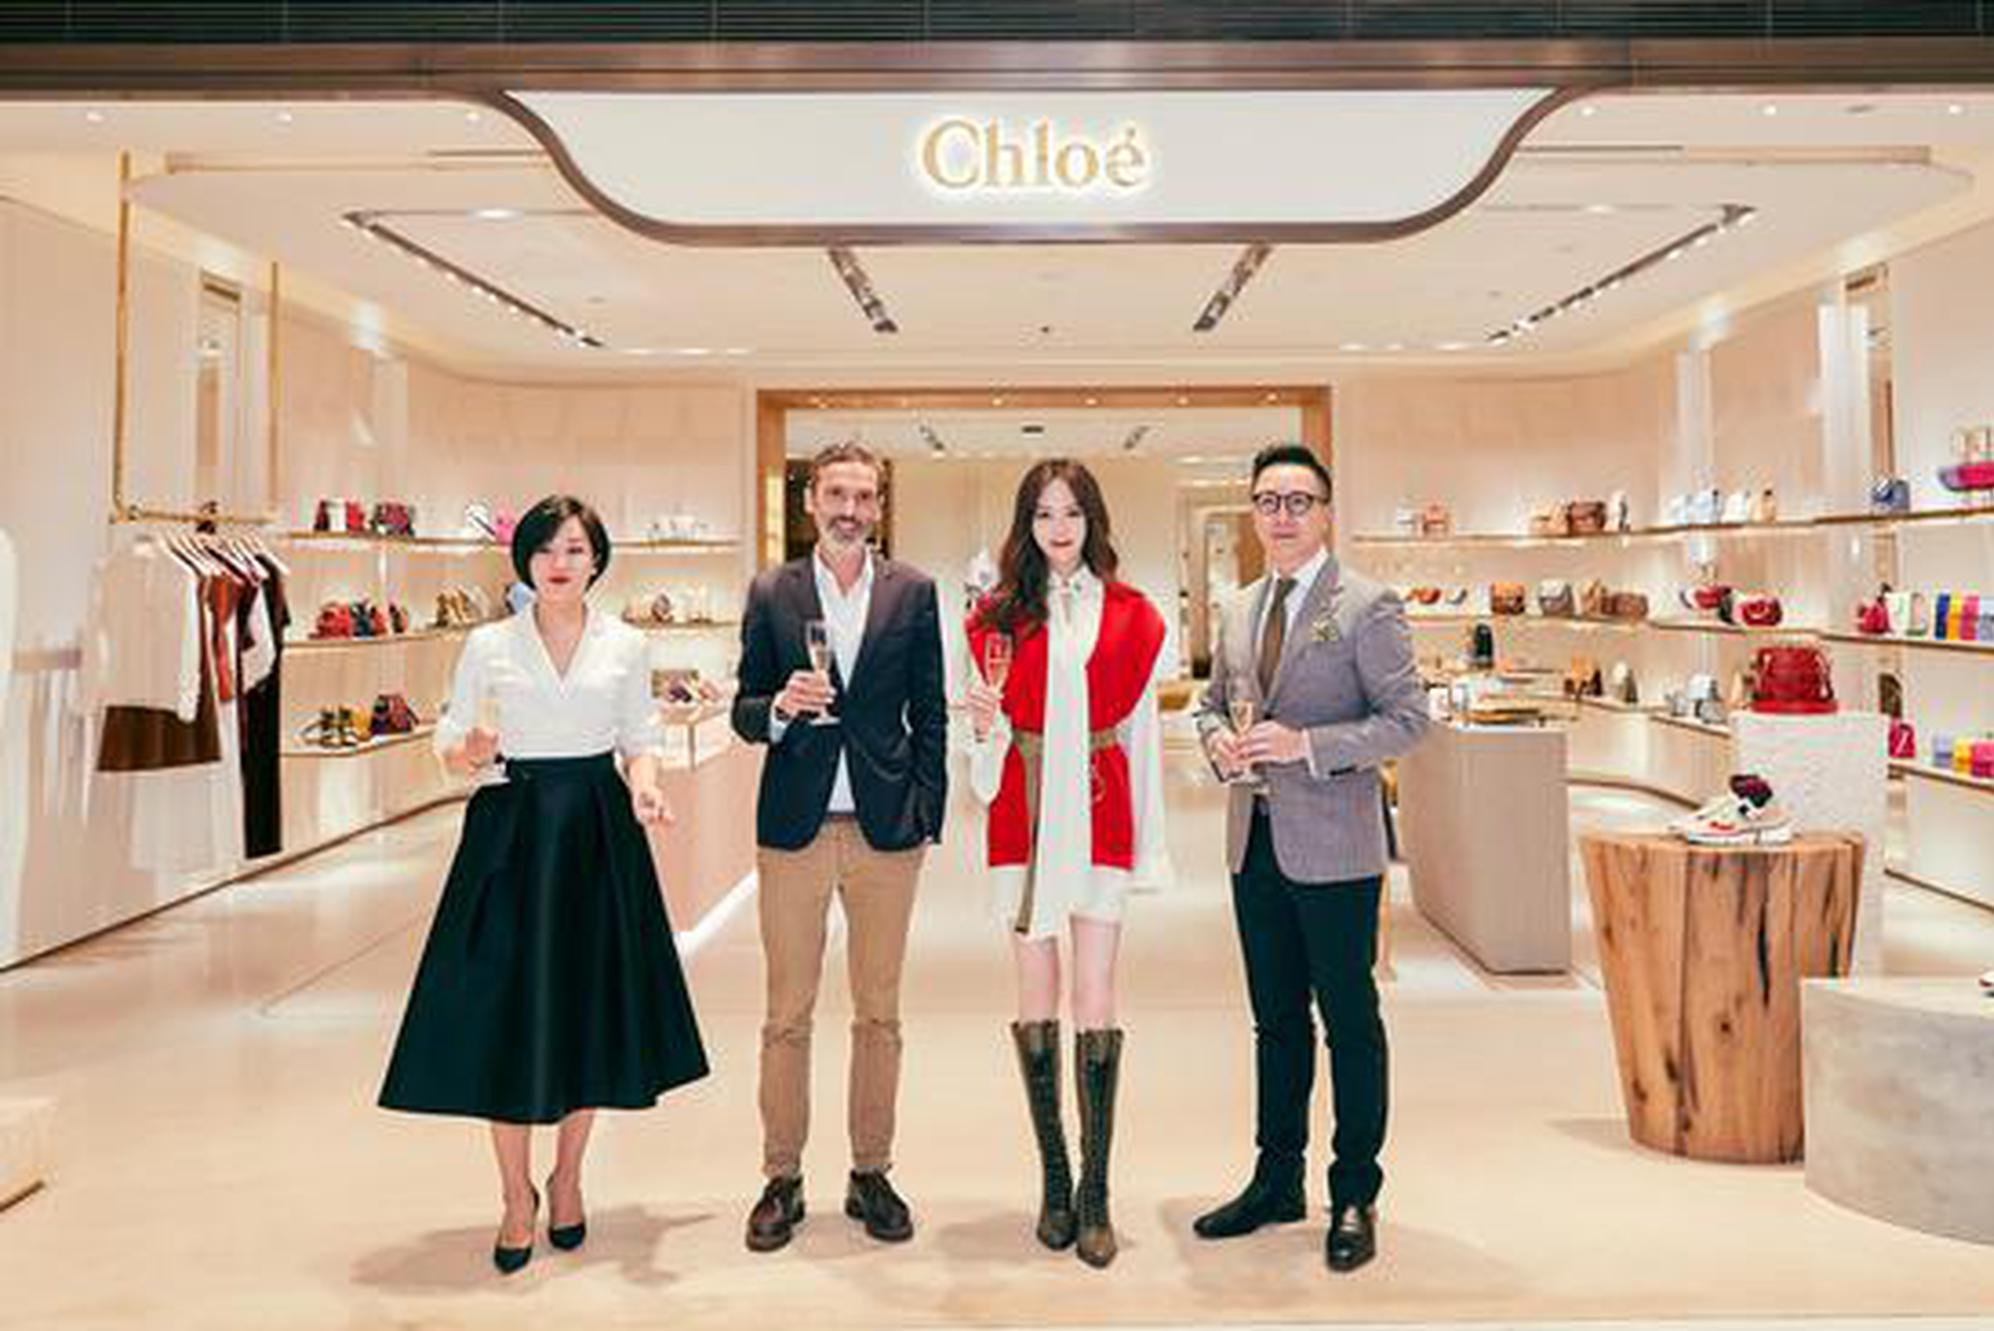 Chloé 精品店西安SKP盛大揭幕